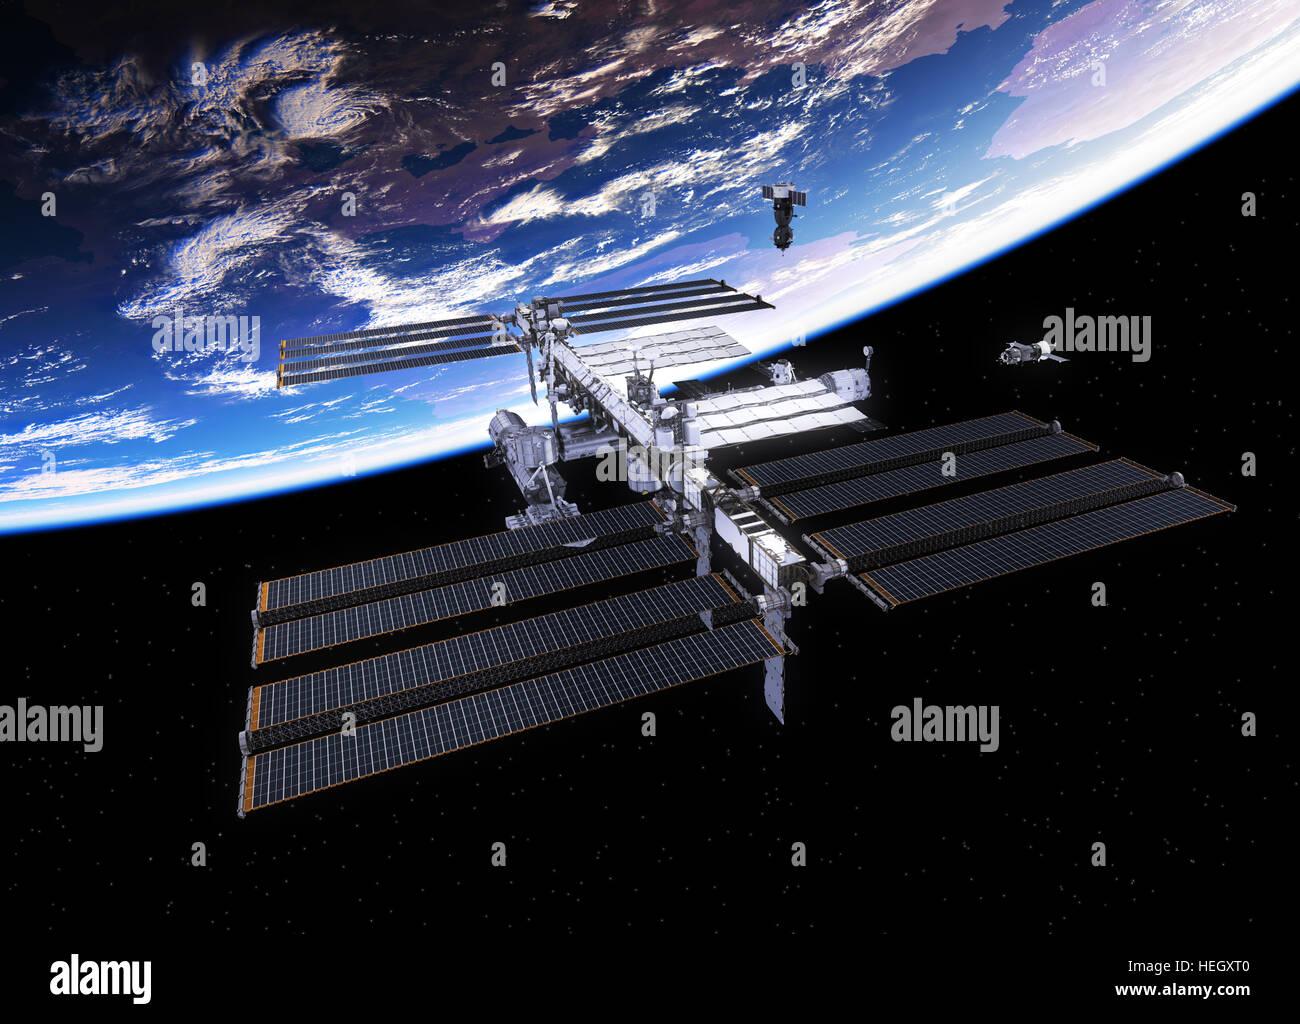 Satellites et la Station spatiale internationale. 3D Illustration. Photo Stock